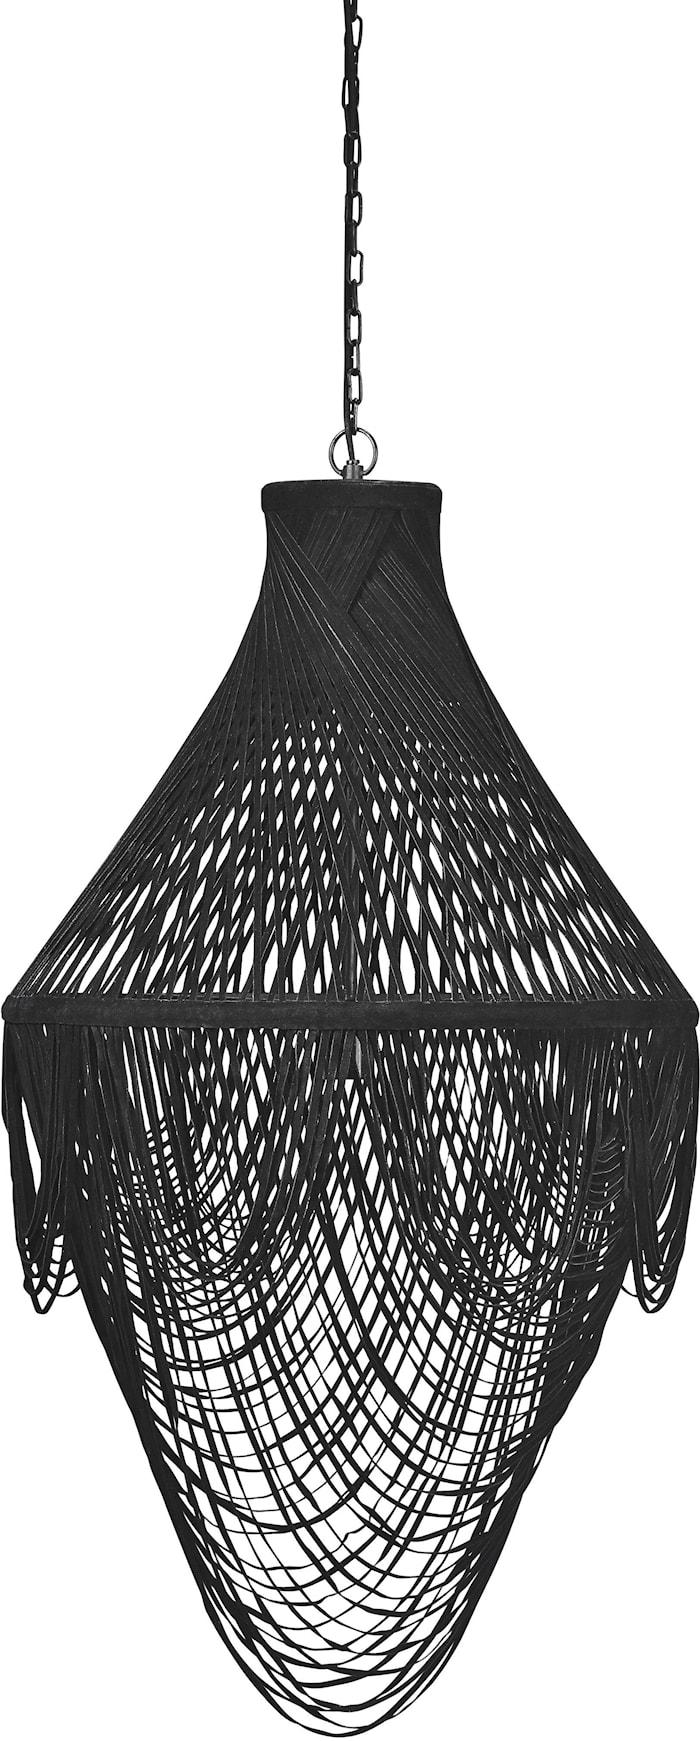 Mauritz Takkrone Svart 100 cm